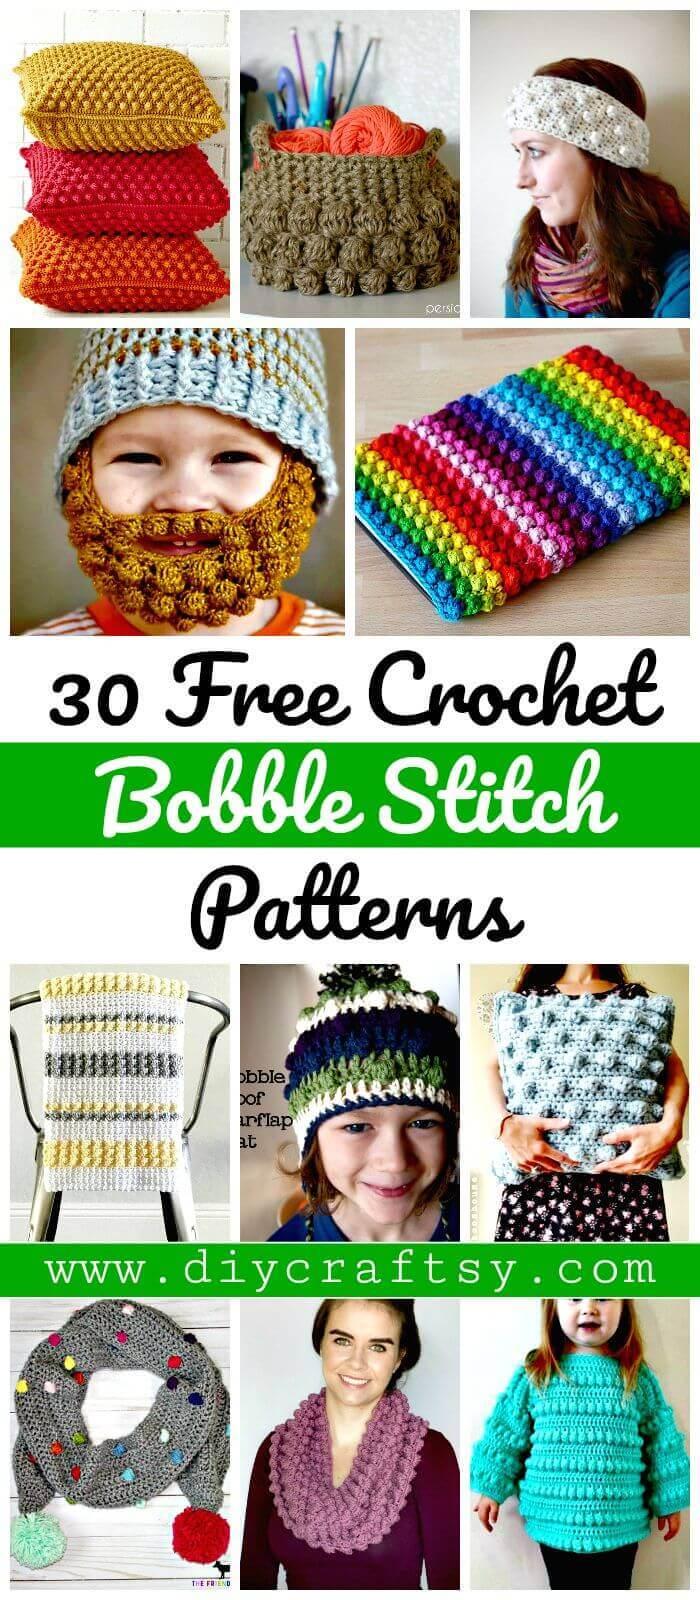 Crochet Bobble Stitch - 30 patrones de crochet Bobble Stitch gratis - Manualidades de bricolaje